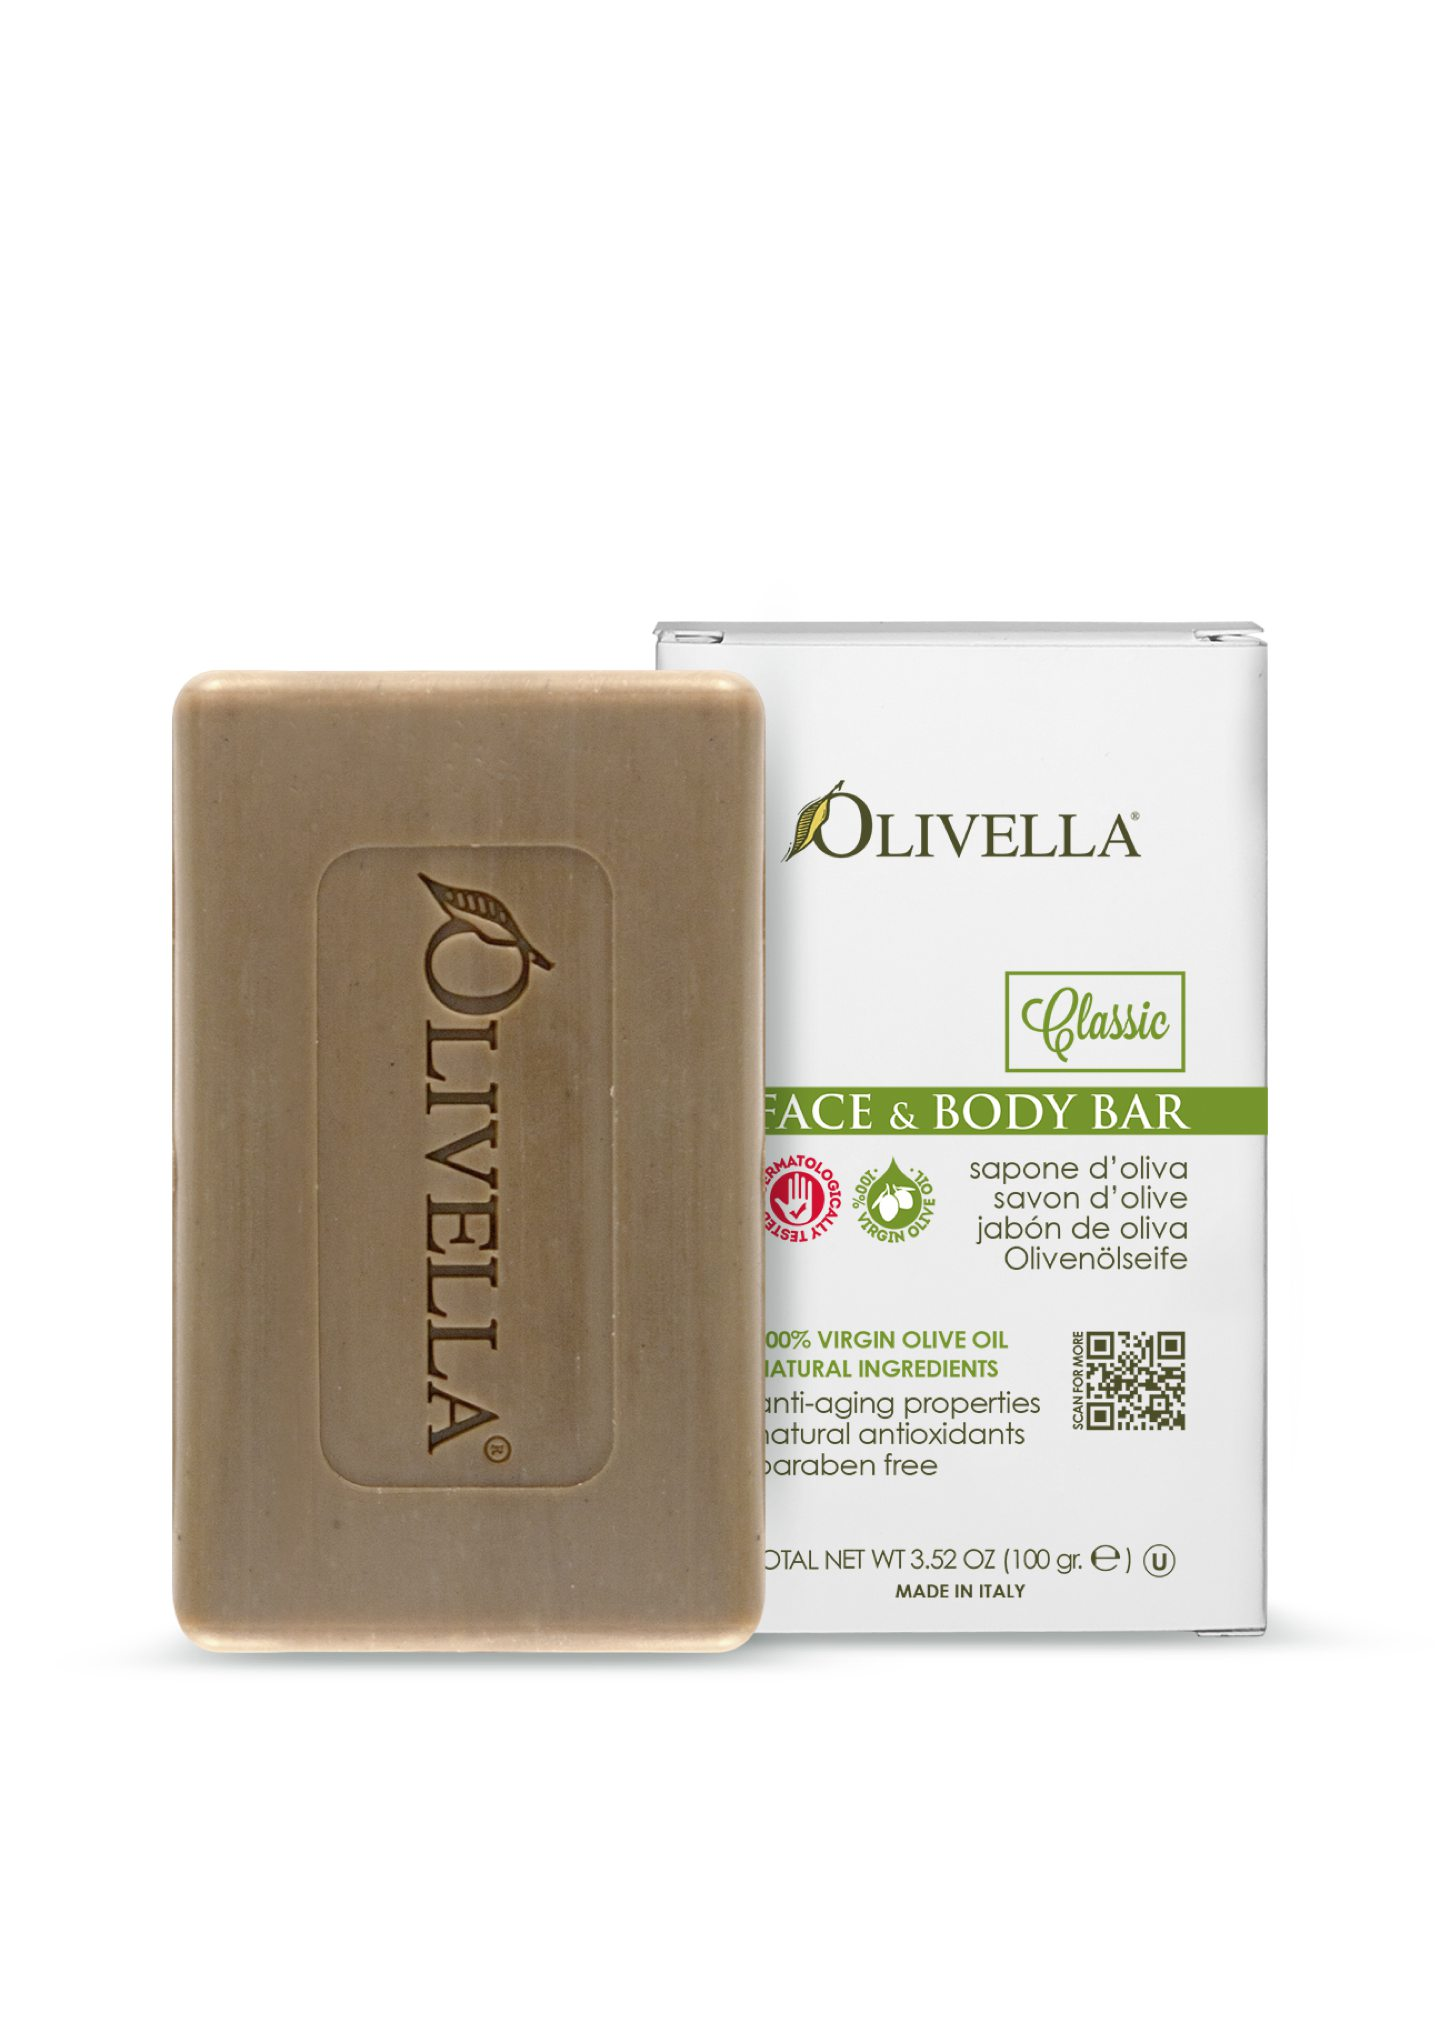 Olivella Face & Body Bar Soap - Classic Orginal (small Size)